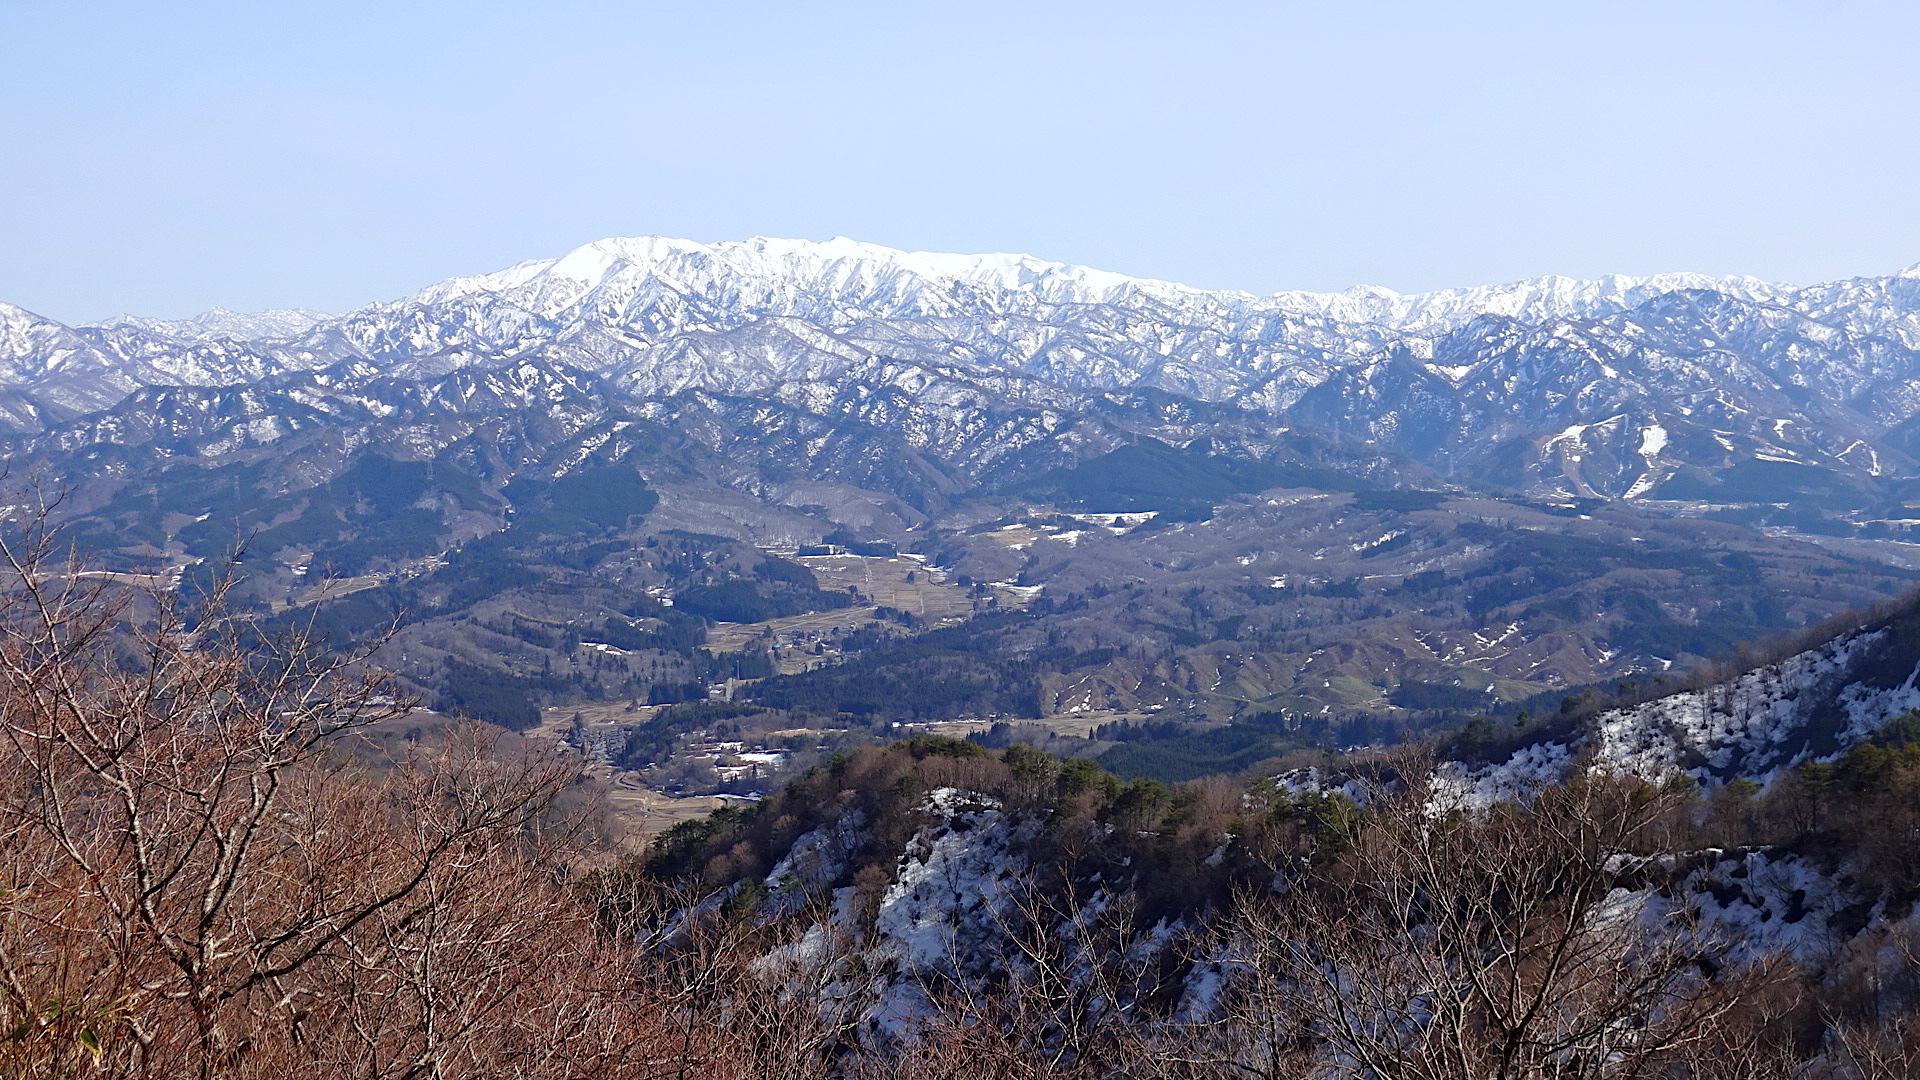 https://cdn-ak.f.st-hatena.com/images/fotolife/s/shioshiohida/20180331/20180331144010_original.jpg